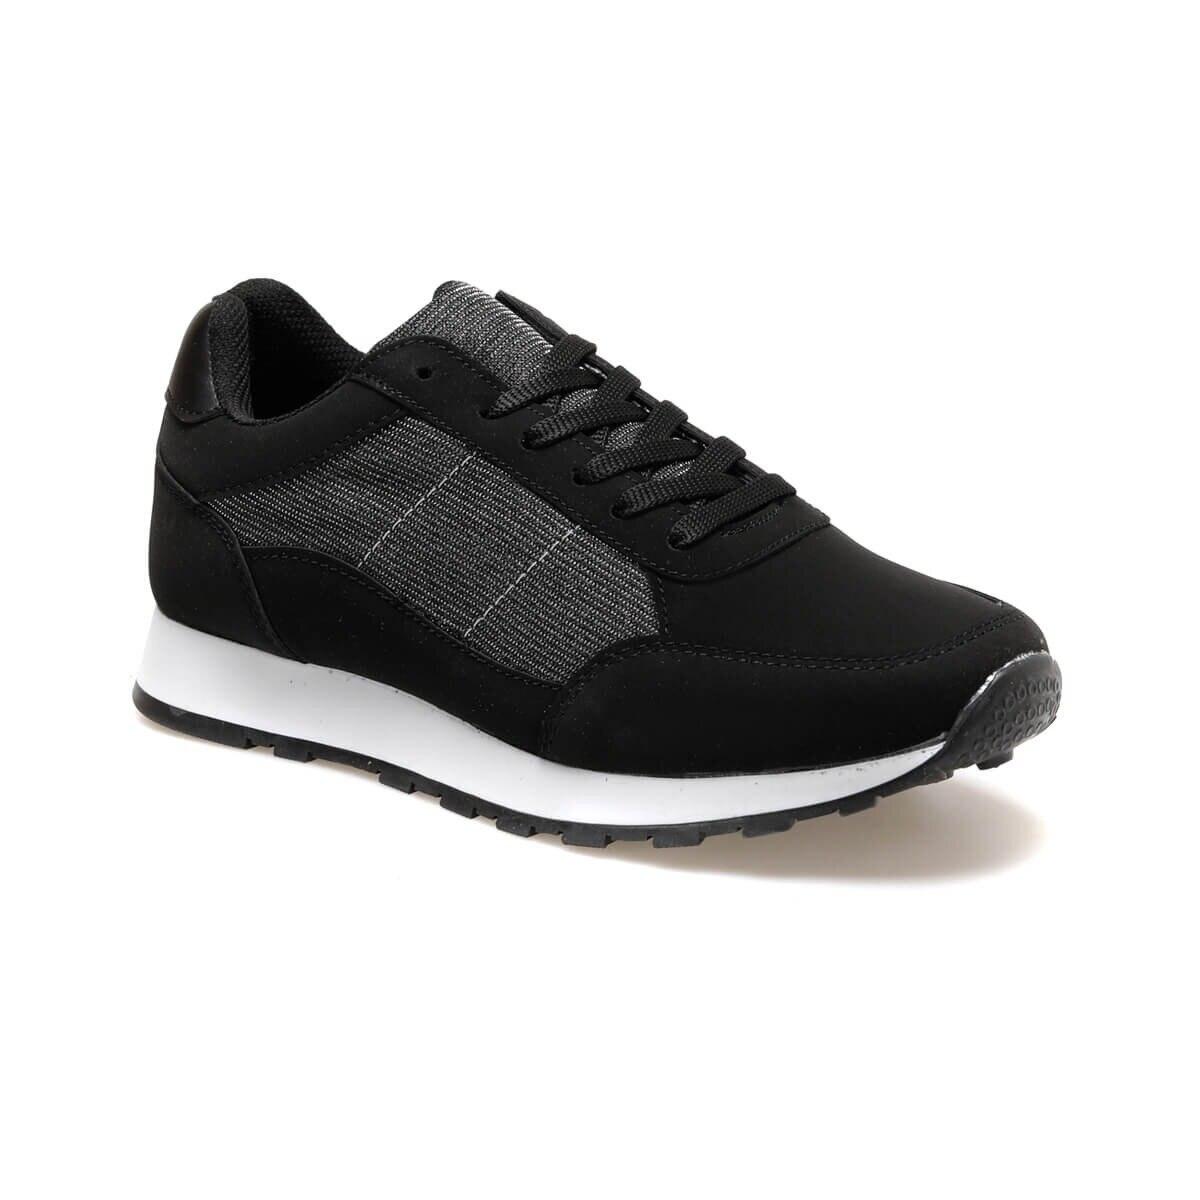 FLO LENA W Black Women 'S Sneaker Shoes Torex